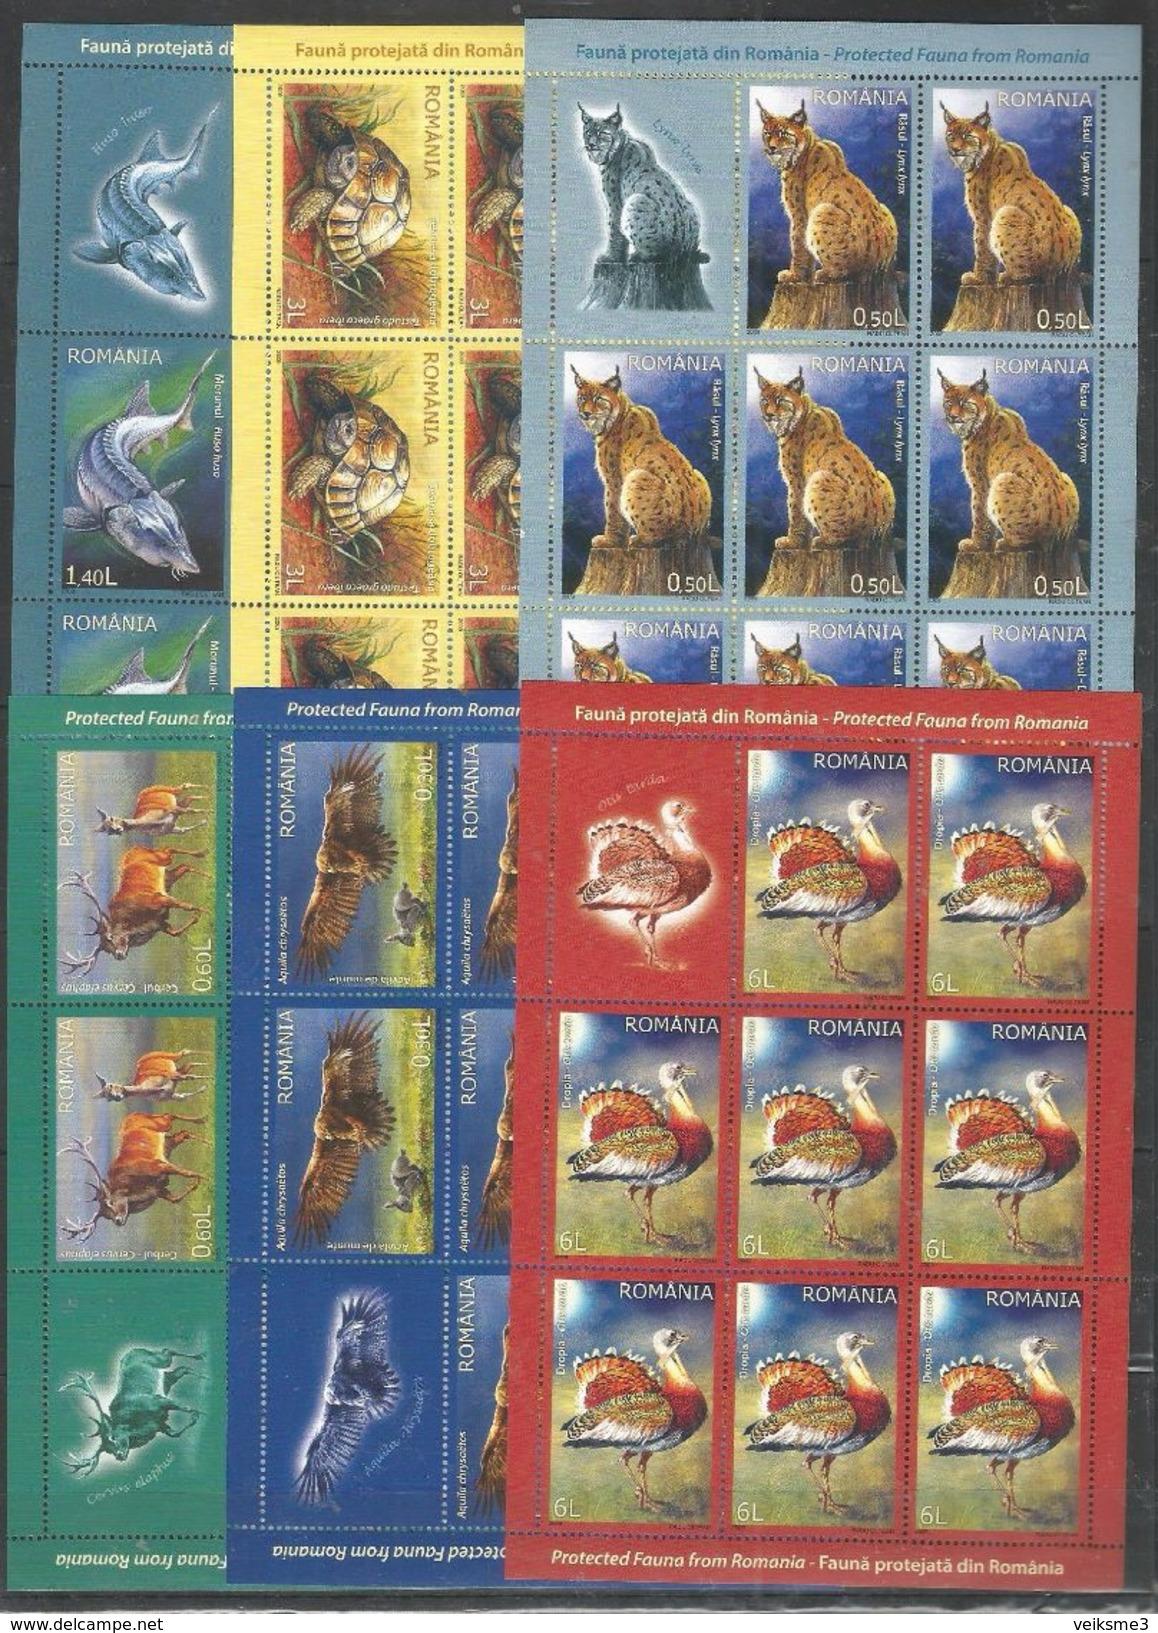 8x ROMANIA - MNH - Art - Animals - Birds - Wild Animals - Fishes - Pájaros